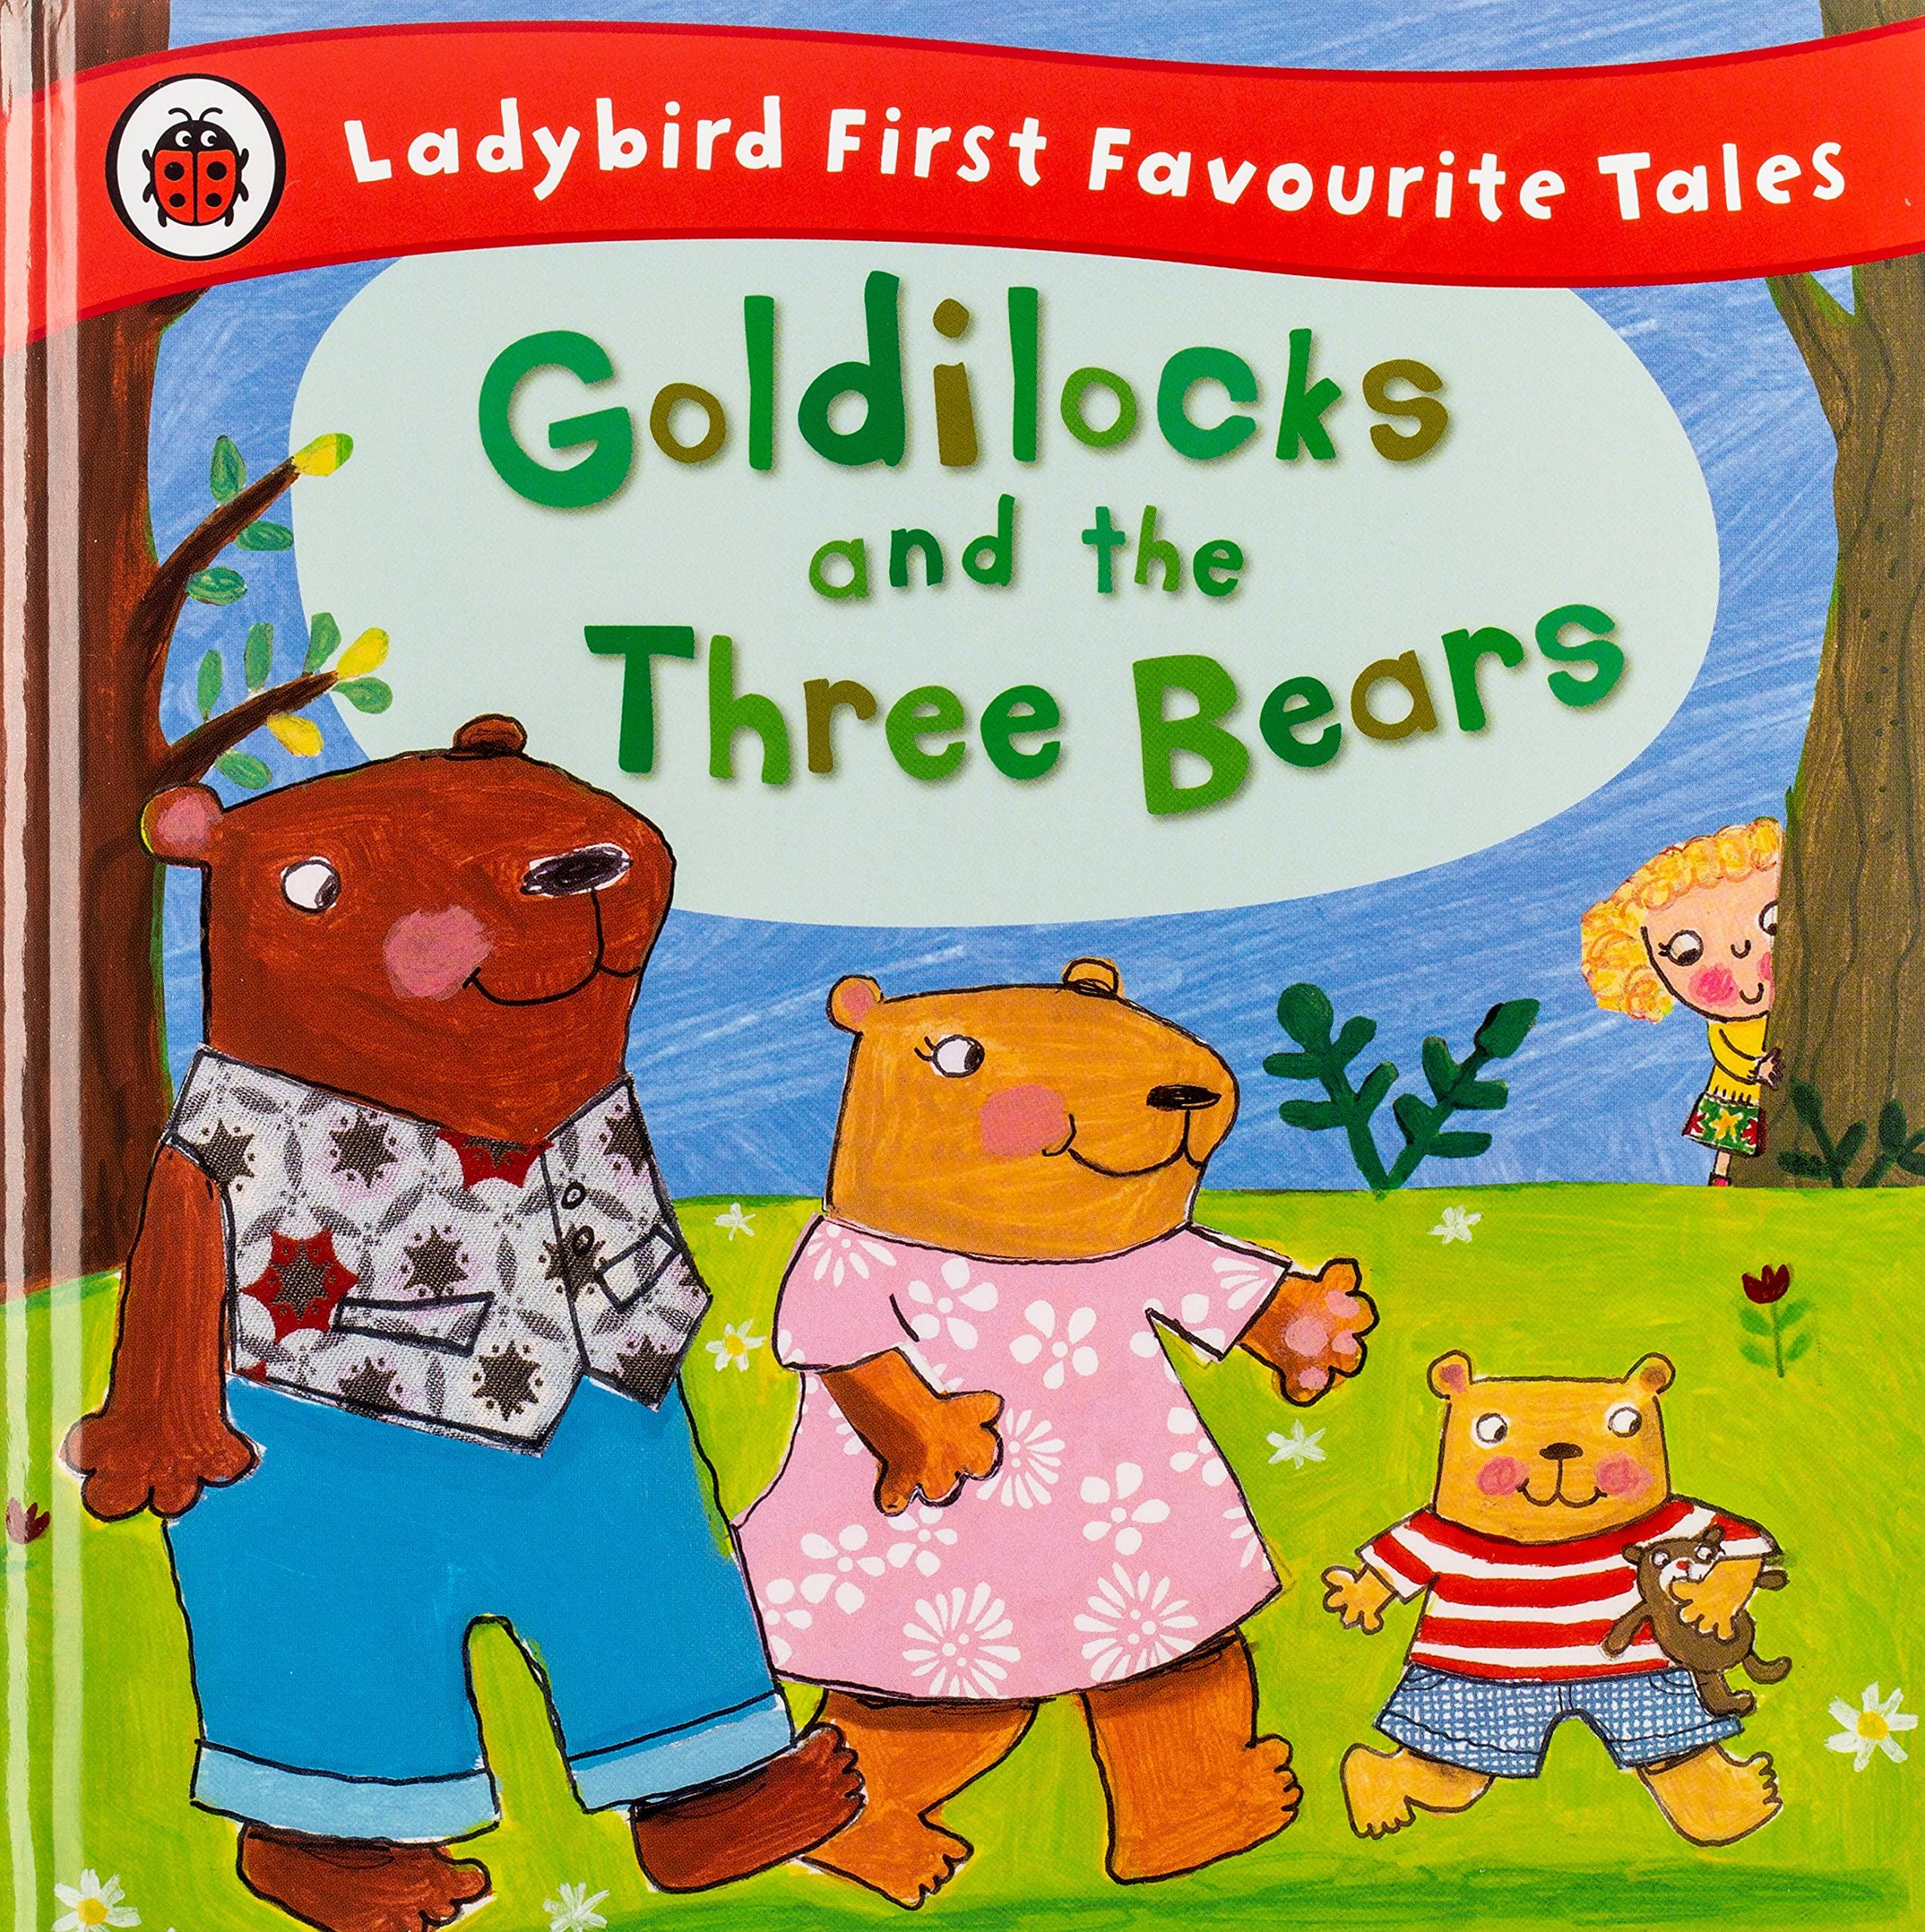 Goldilocks and the Three Bears: Ladybird First Favourite Tales:  Amazon.co.uk: Baxter, Nicola: 9781409306290: Books